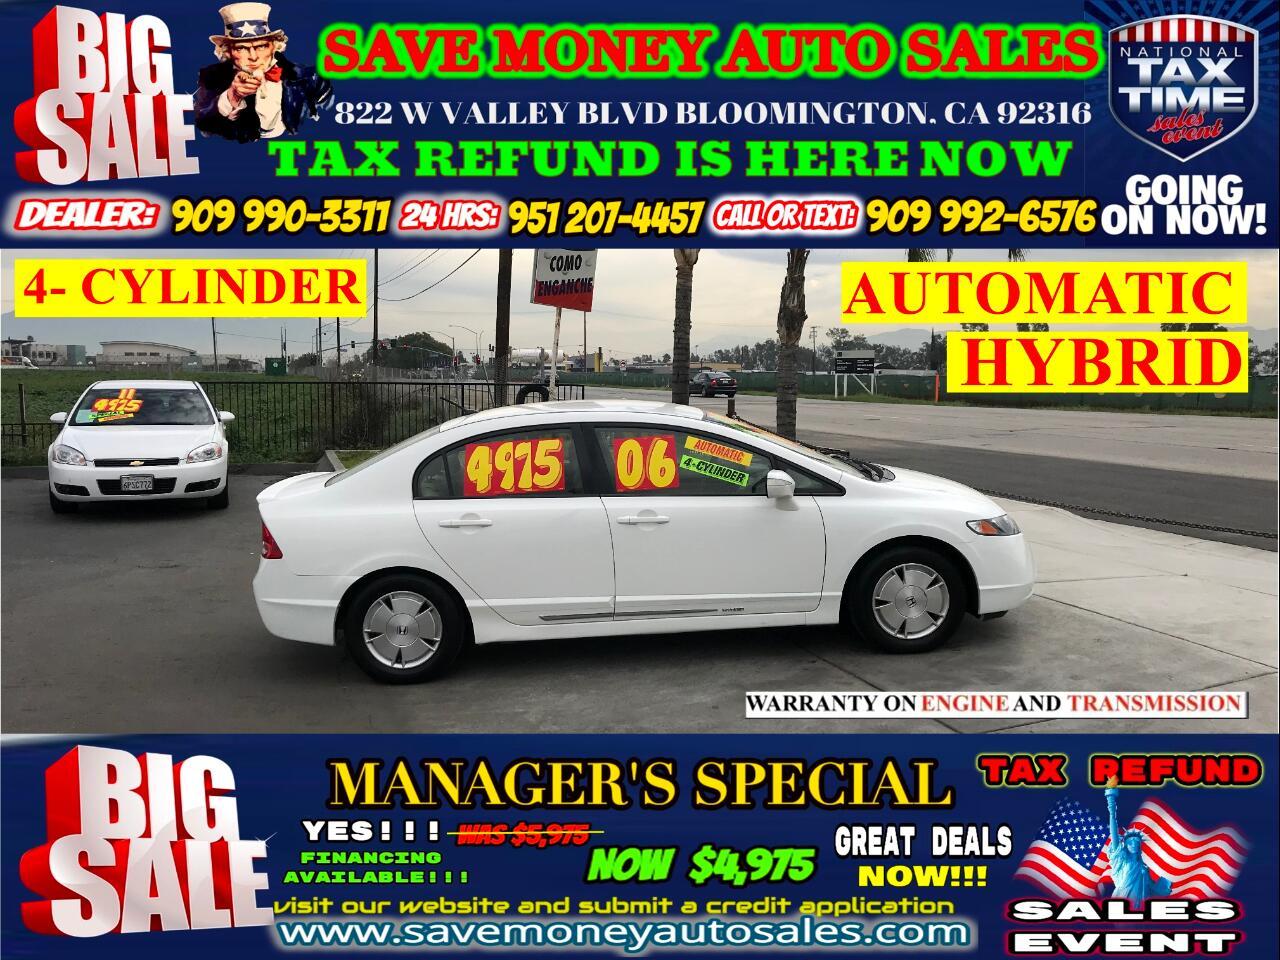 2006 Honda Civic Hybrid HYBRID> 4- CYLINDER> EXTRA CLEAN> FULLY LOADED>